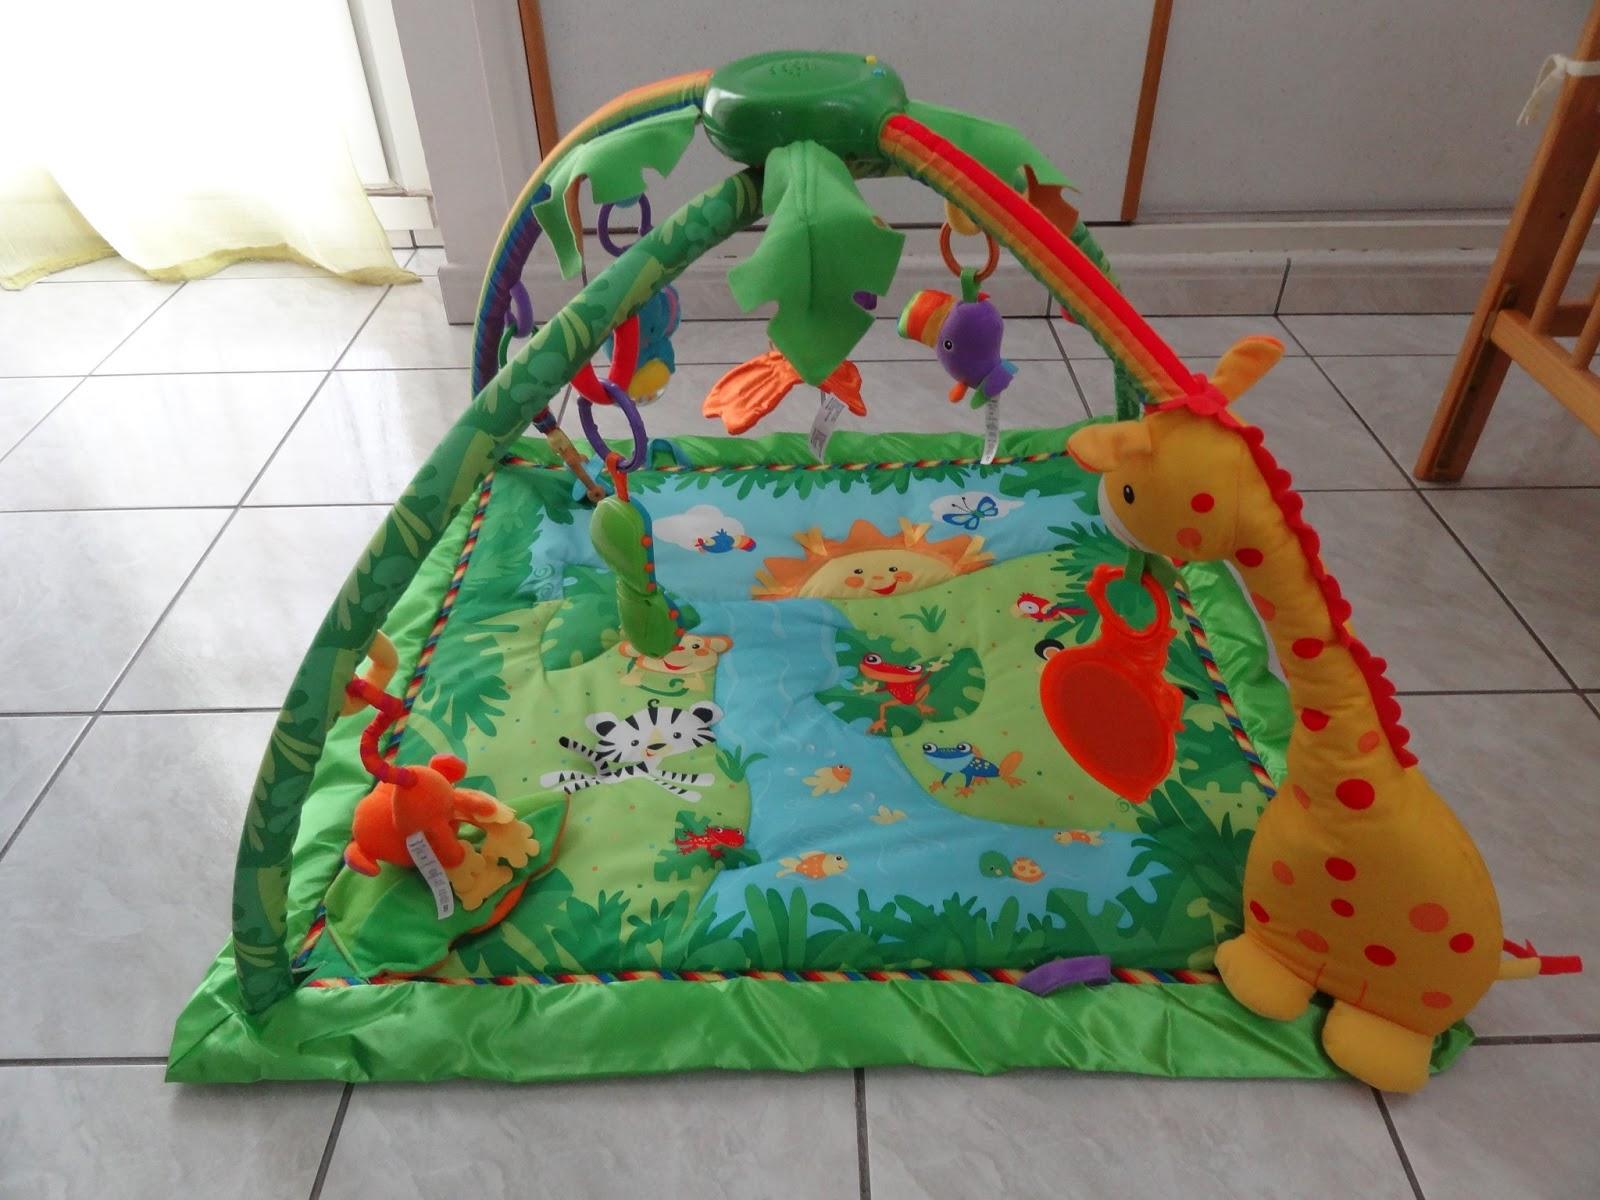 Carrelage Design tapis d eveil jungle : Le tapis du0026#39;u00e9veil de Louloup, le tapis de la Jungle Fisher-Price !!!!